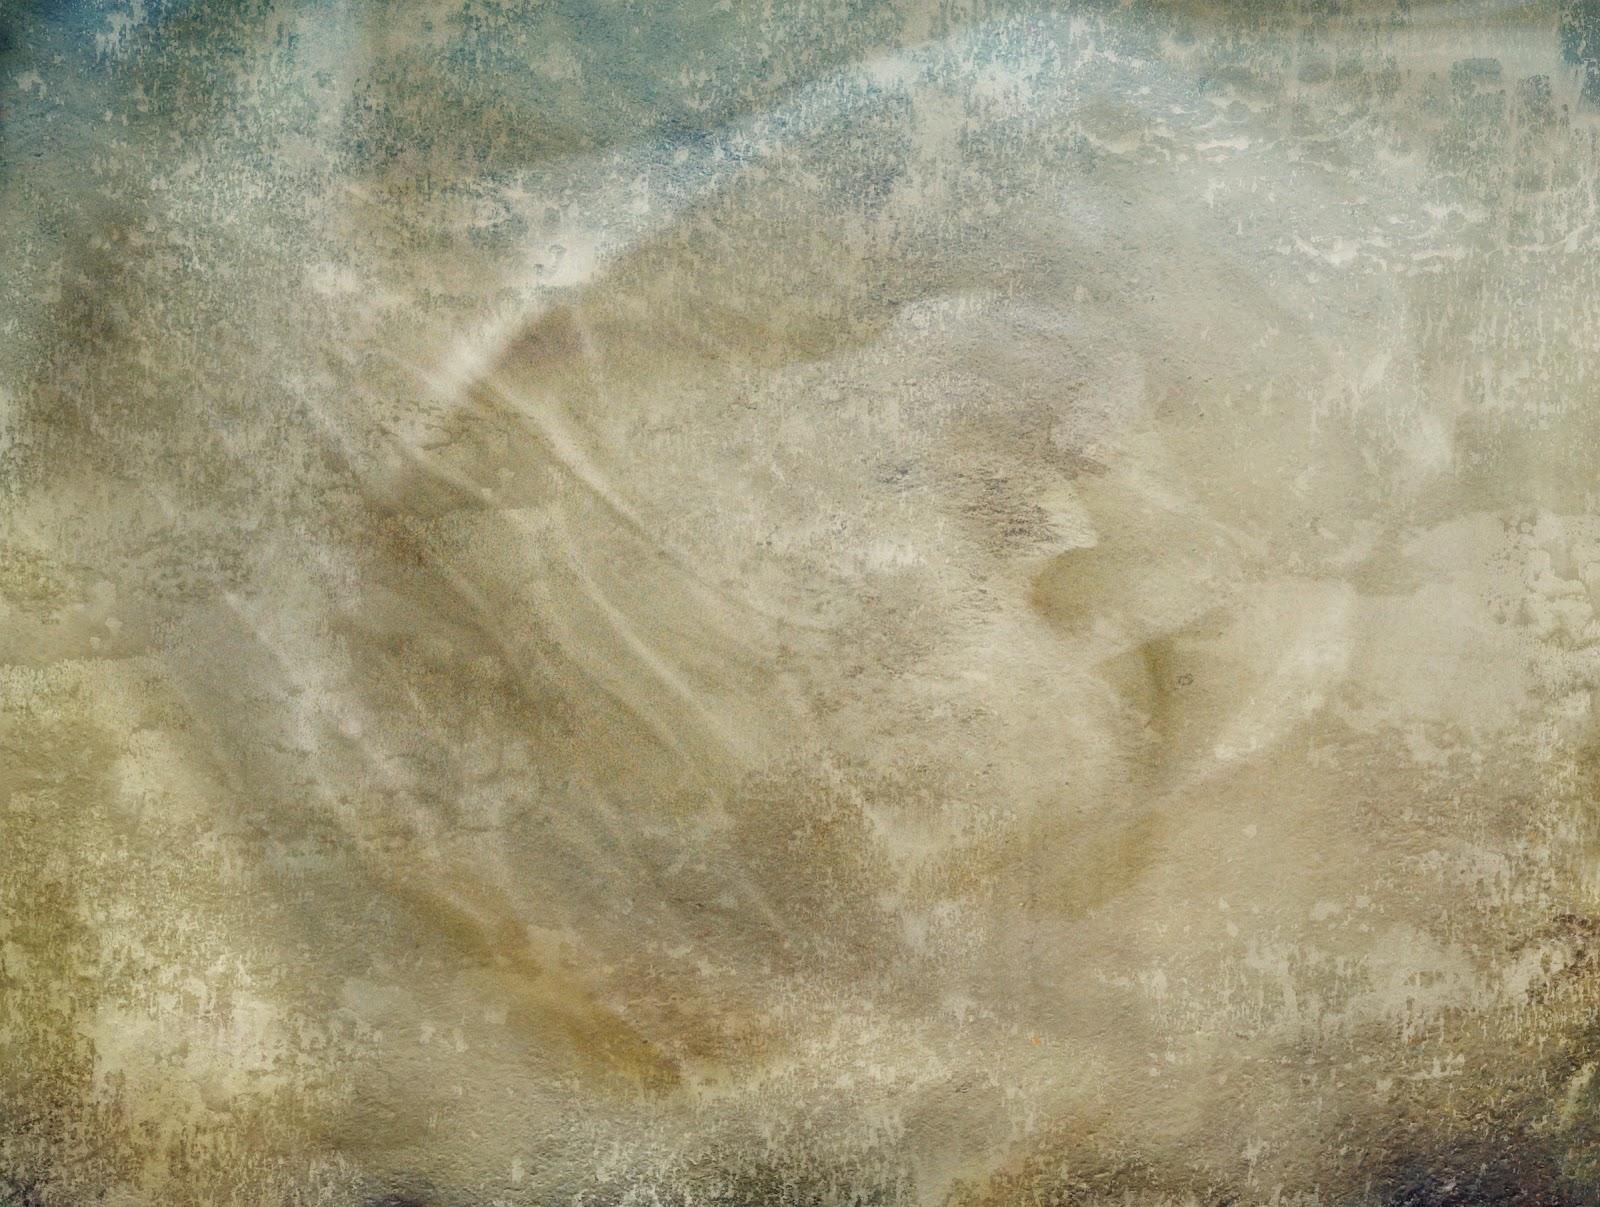 10 best texture images on pinterest | grunge, pattern background